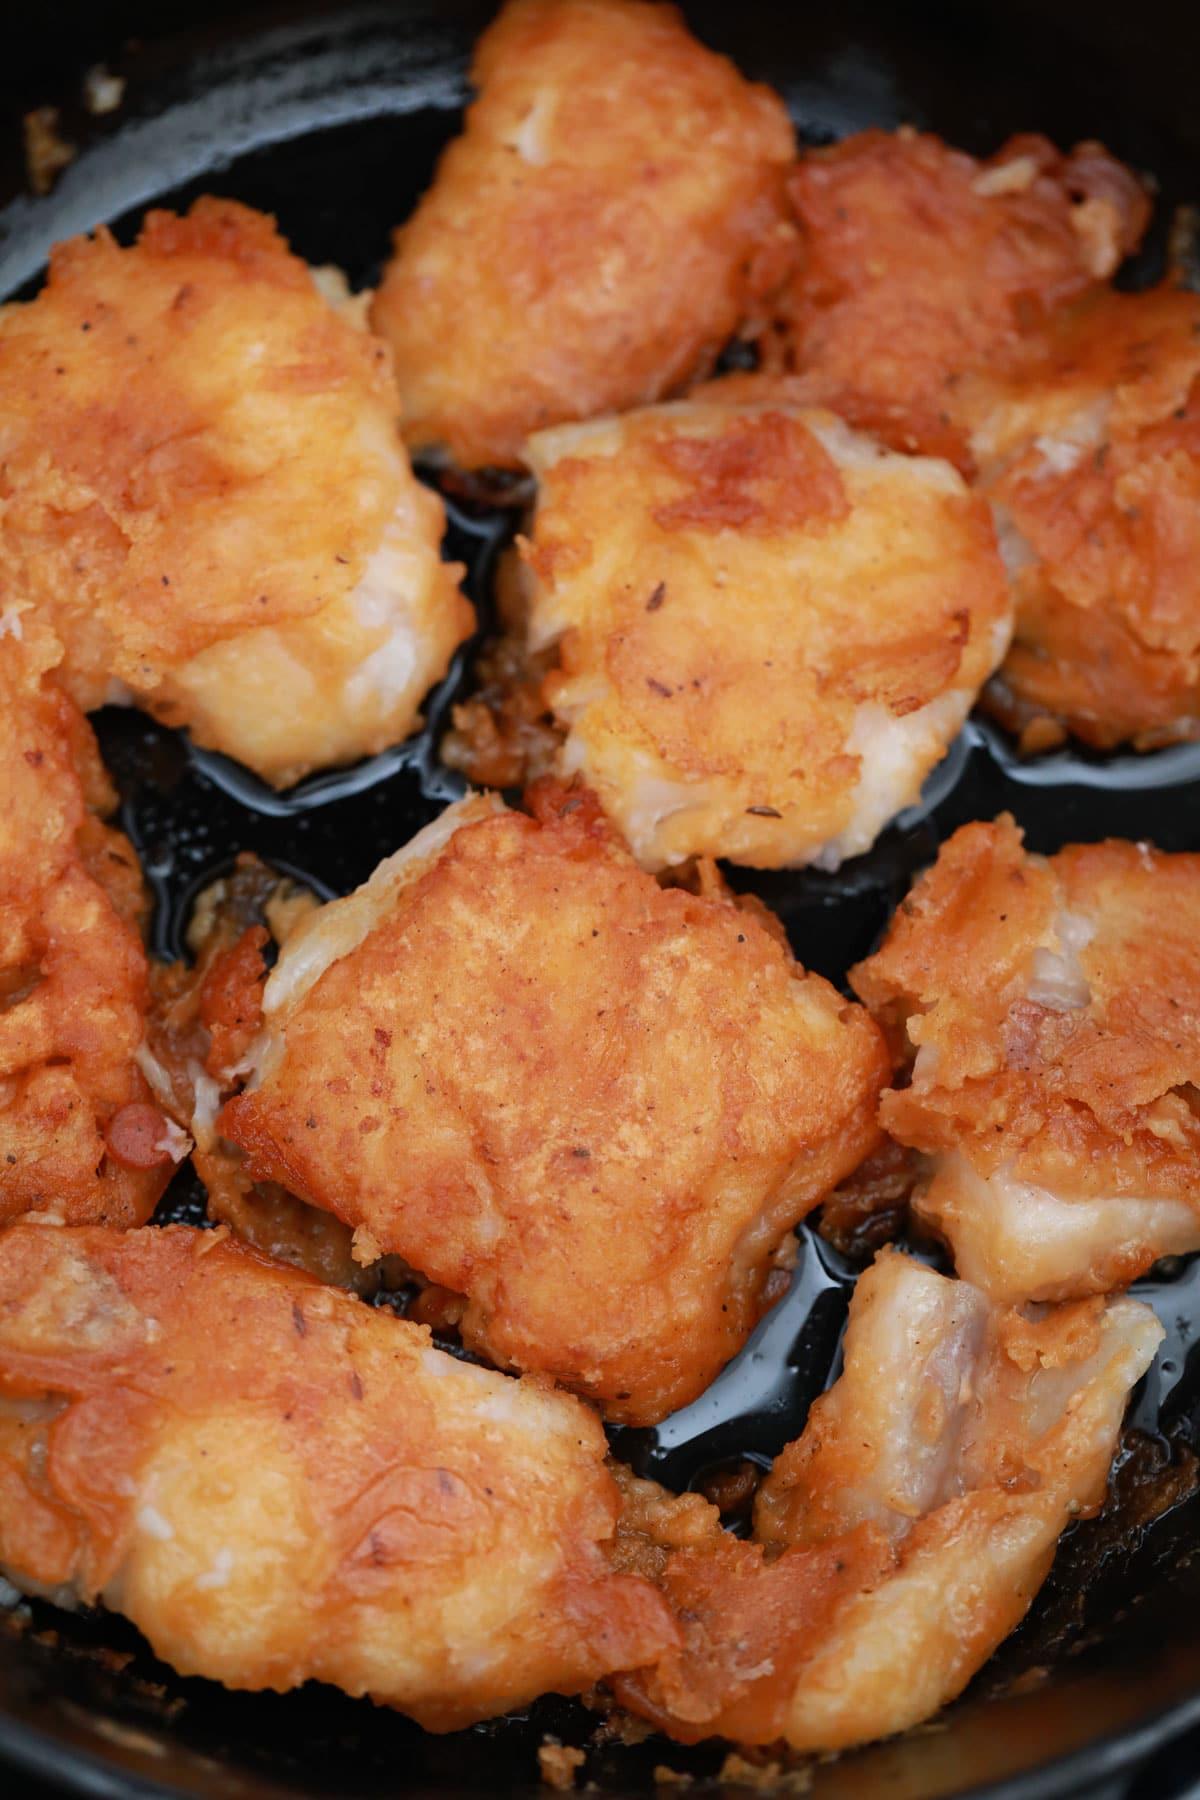 Mahi Mahi filets in cast iron skillet